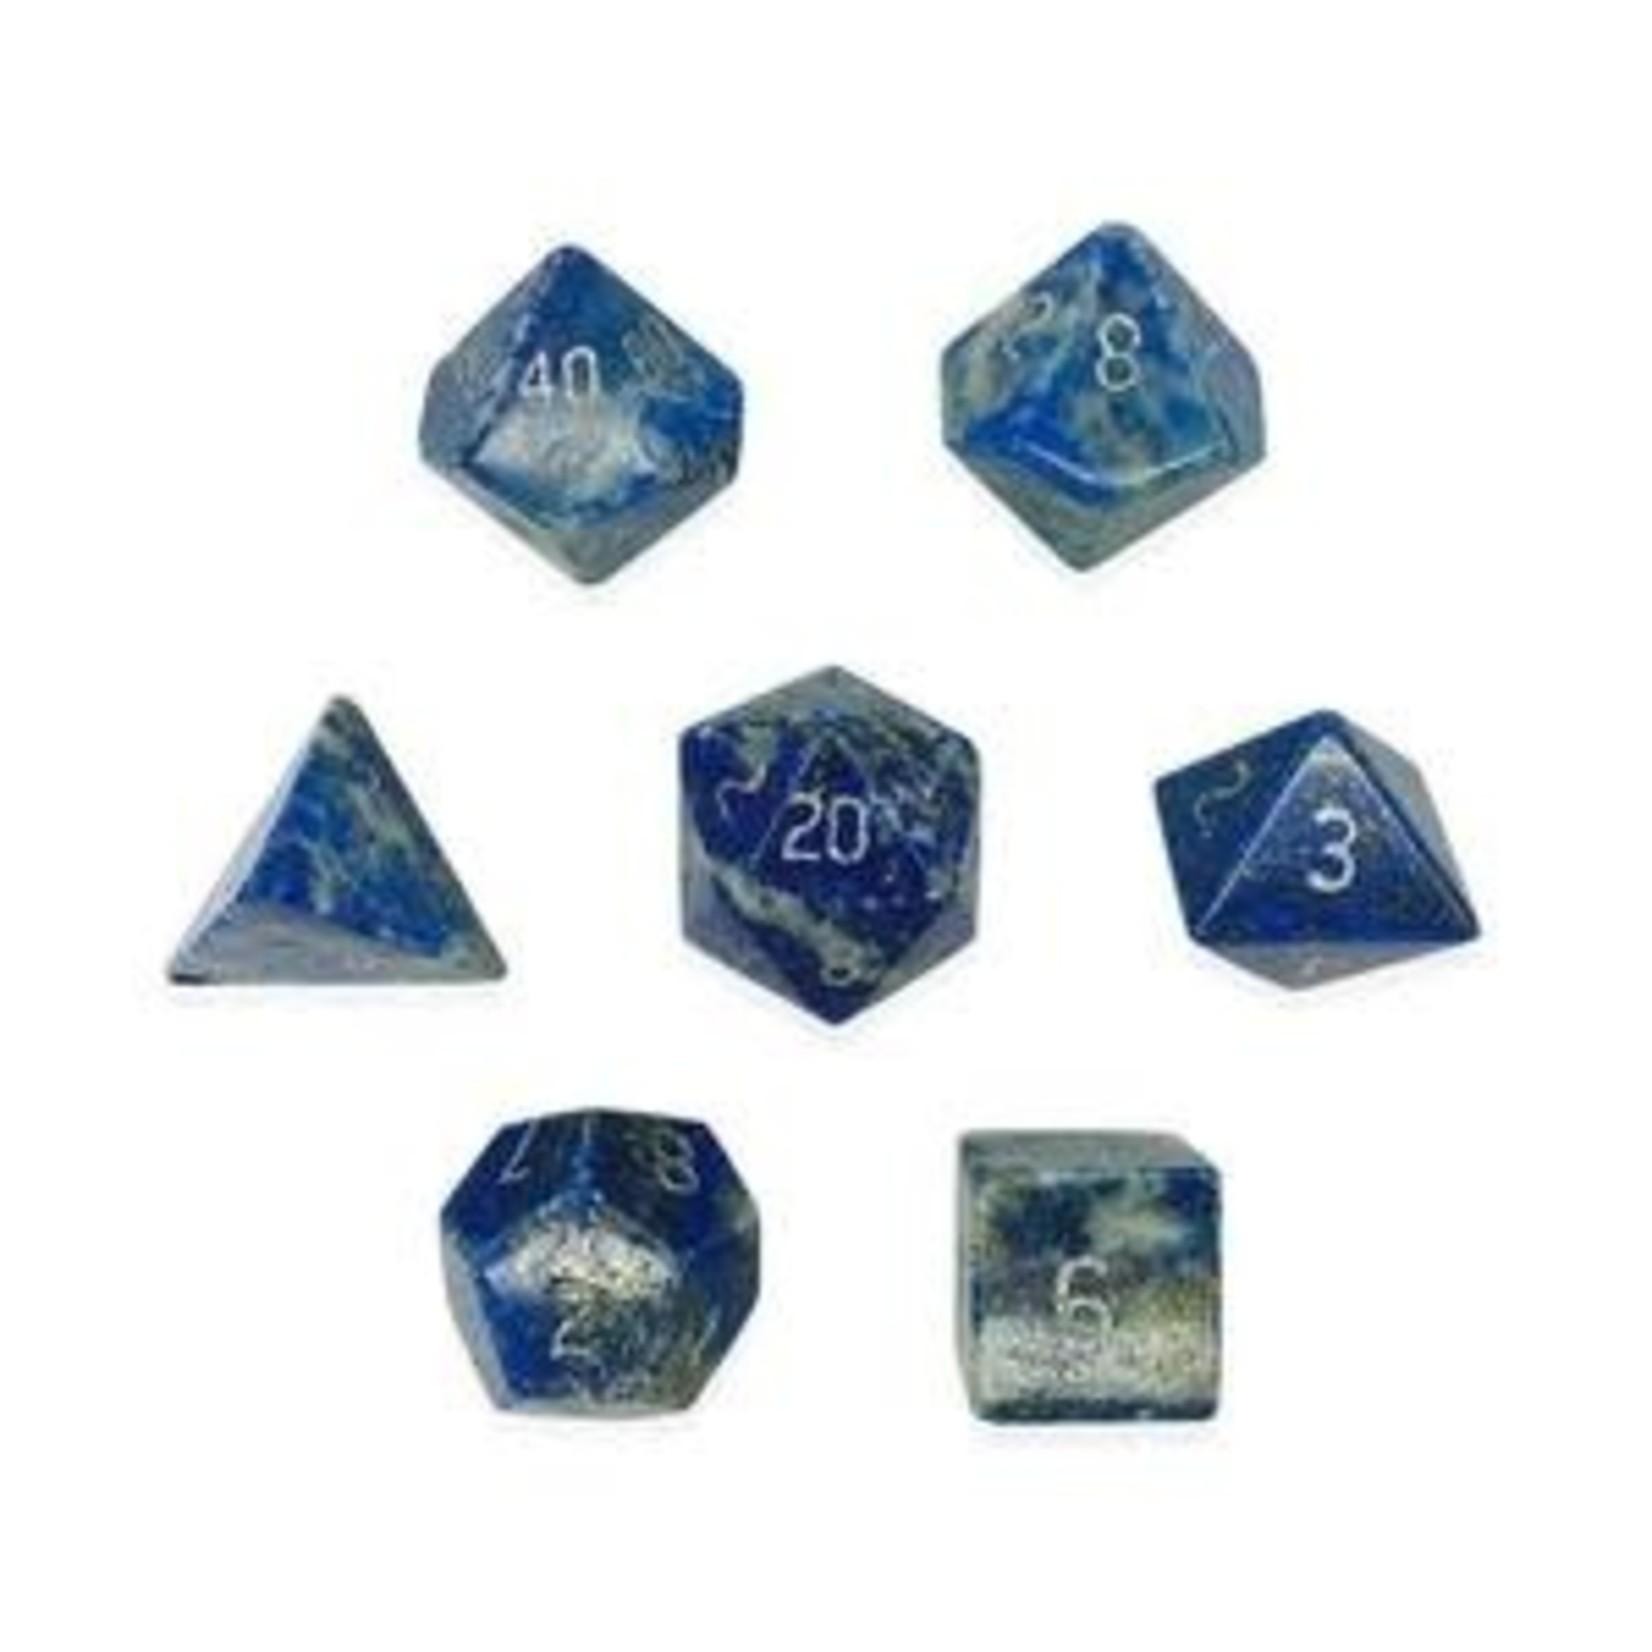 Norse Foundry Norse Foundry Dice: Gemstone Dice Set - Lapis Lazuli